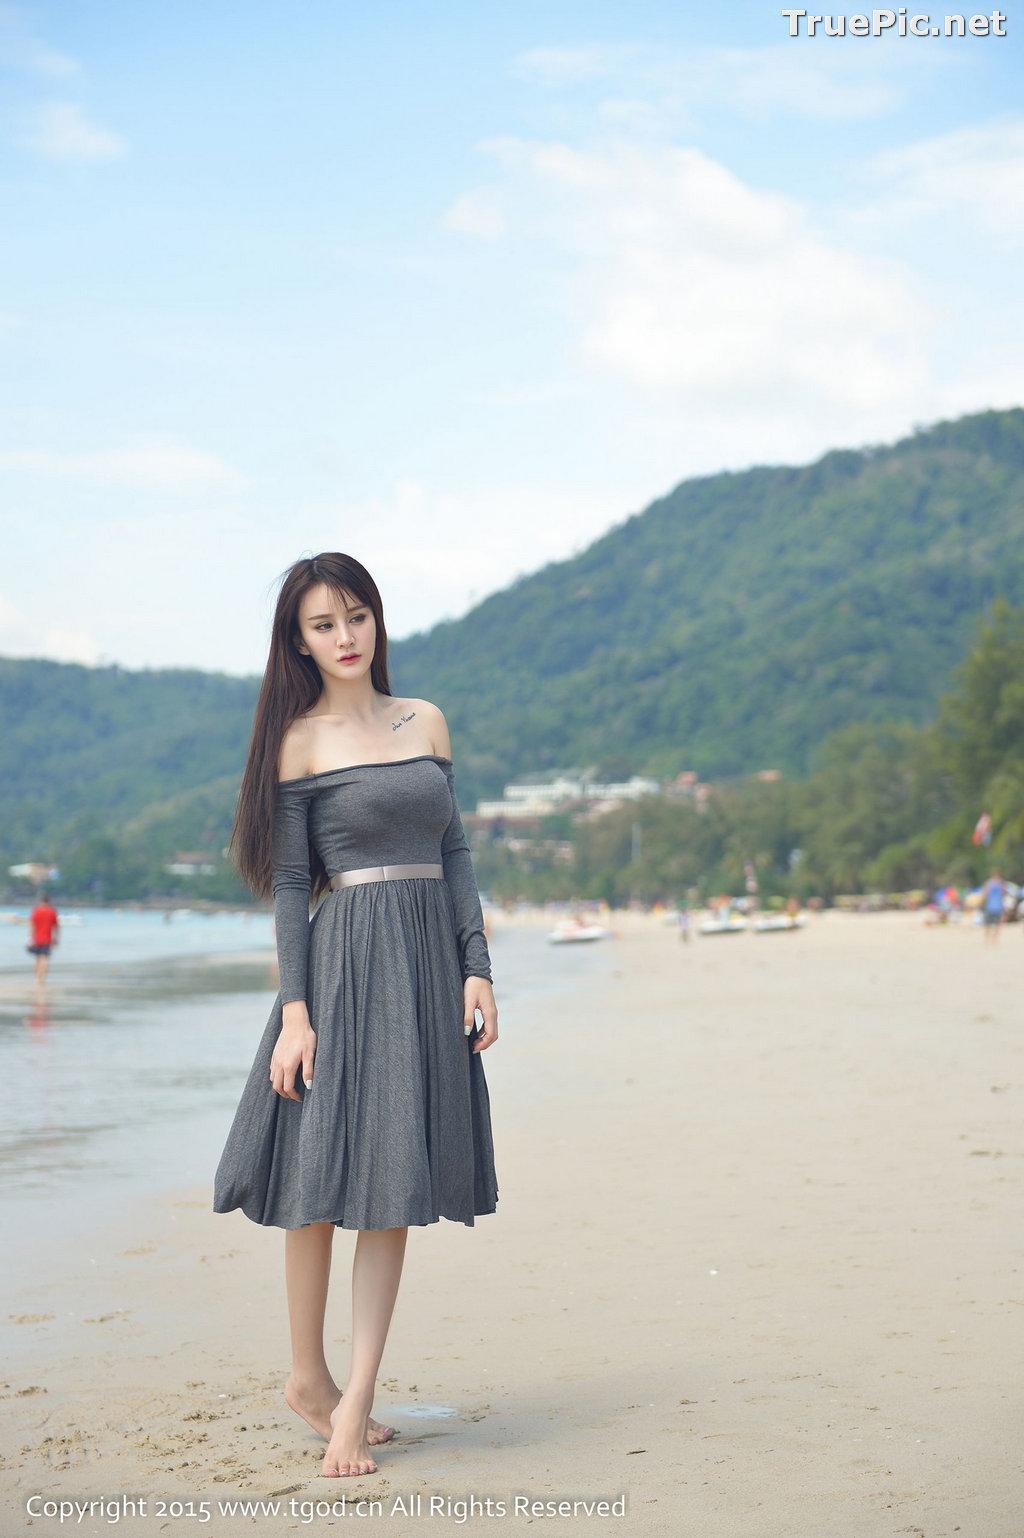 Image TGOD 2015-11-10 - Chinese Sexy Model - Cheryl (青树) - TruePic.net - Picture-44